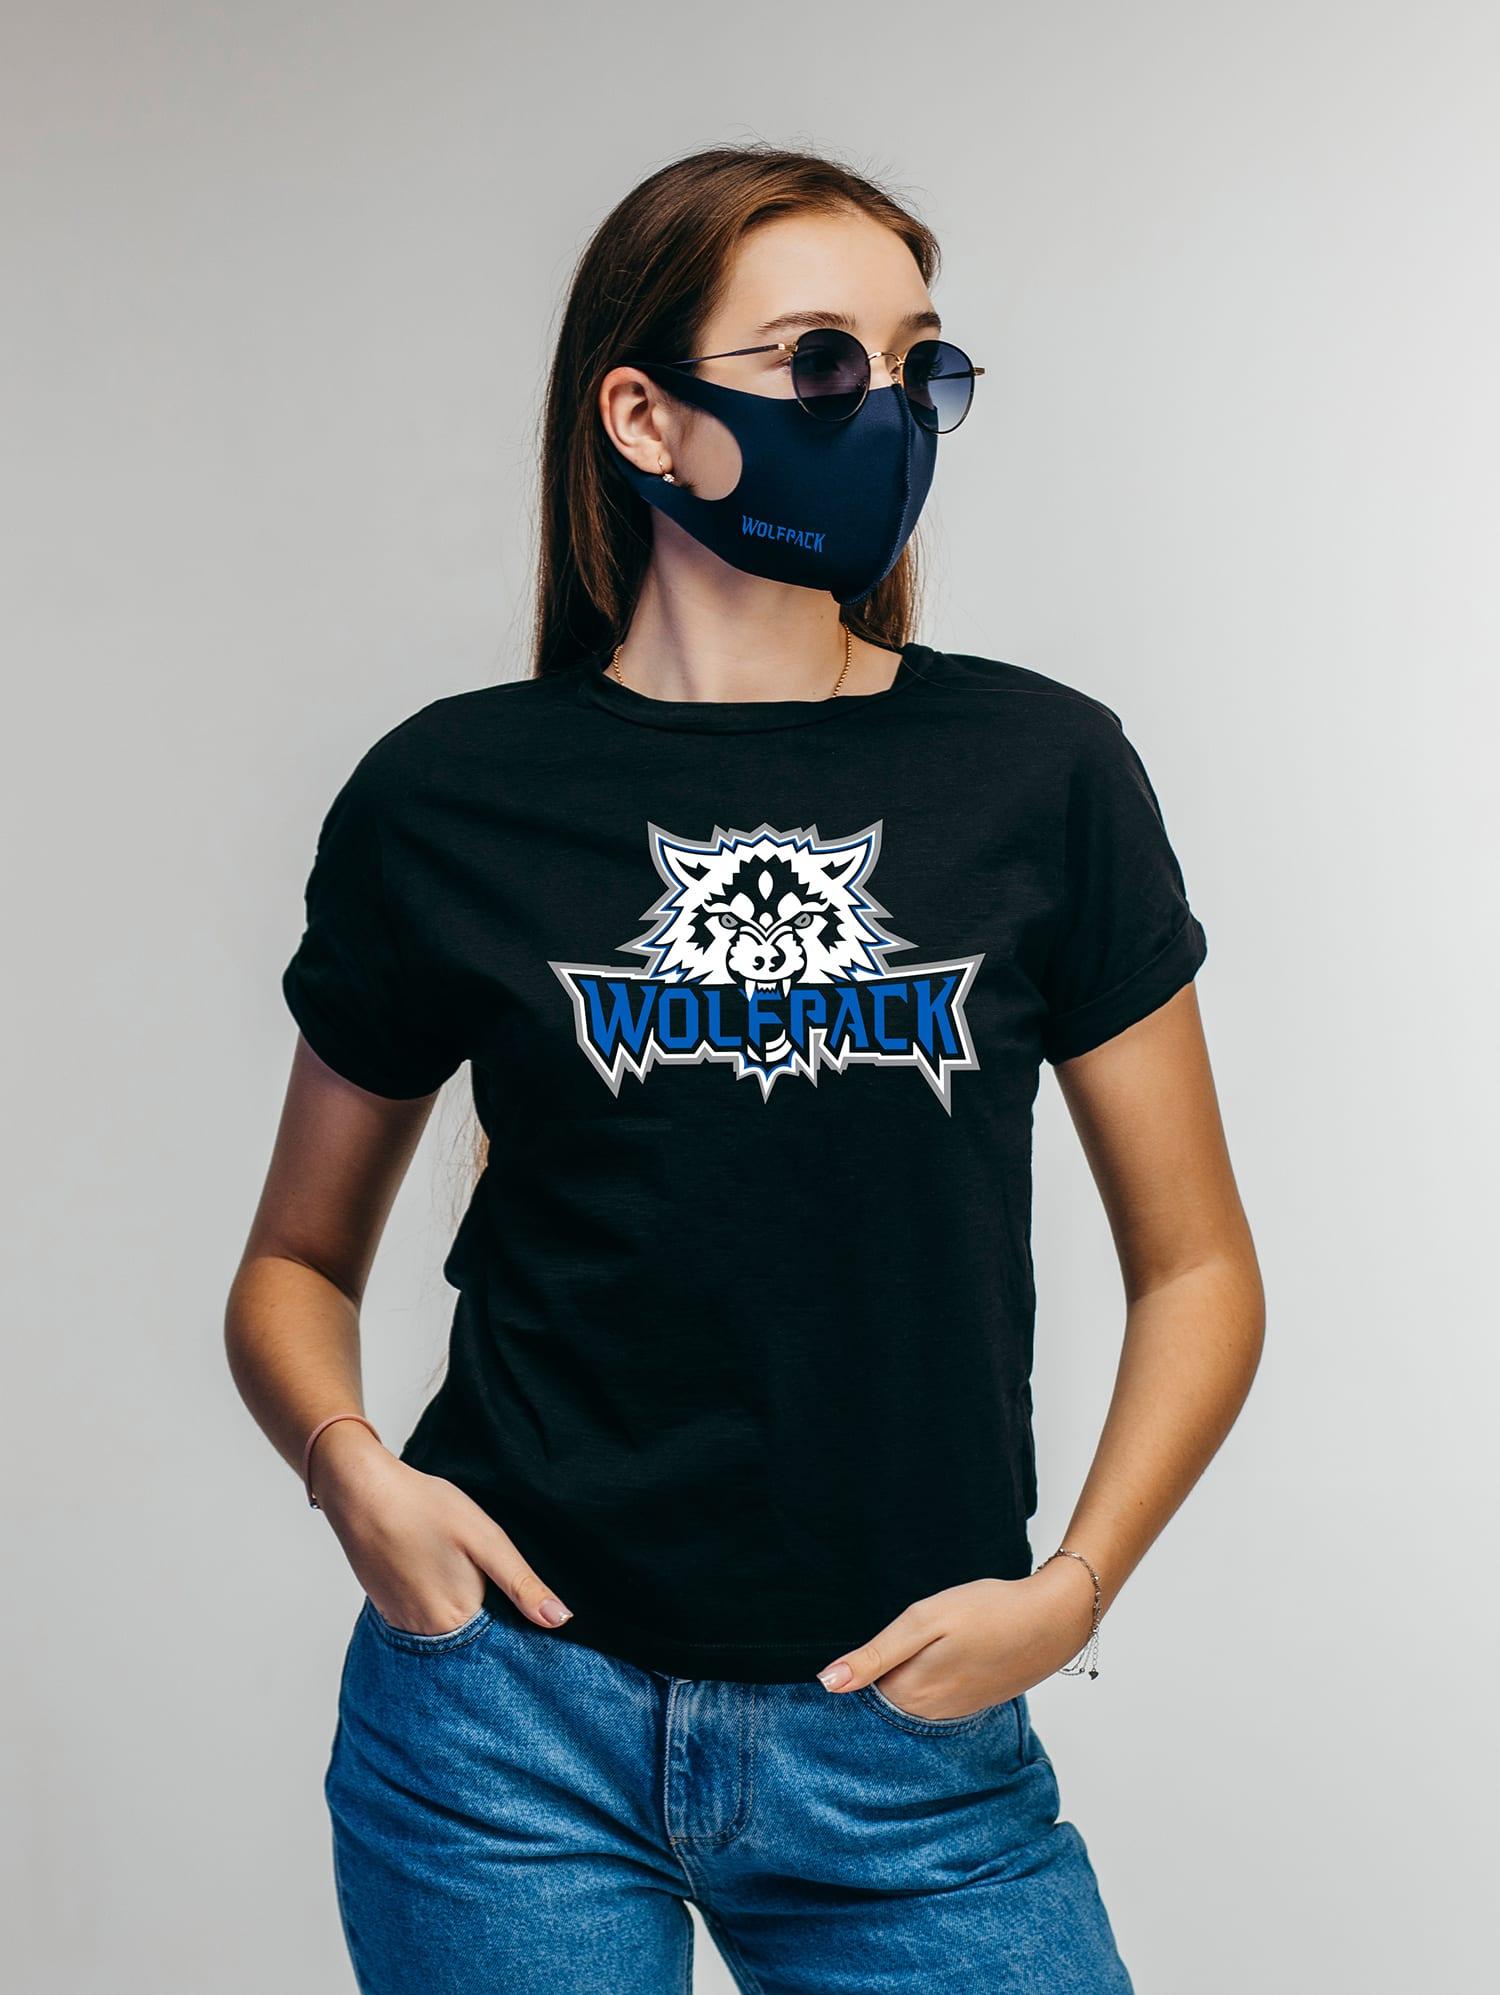 Mask Model1 Option1